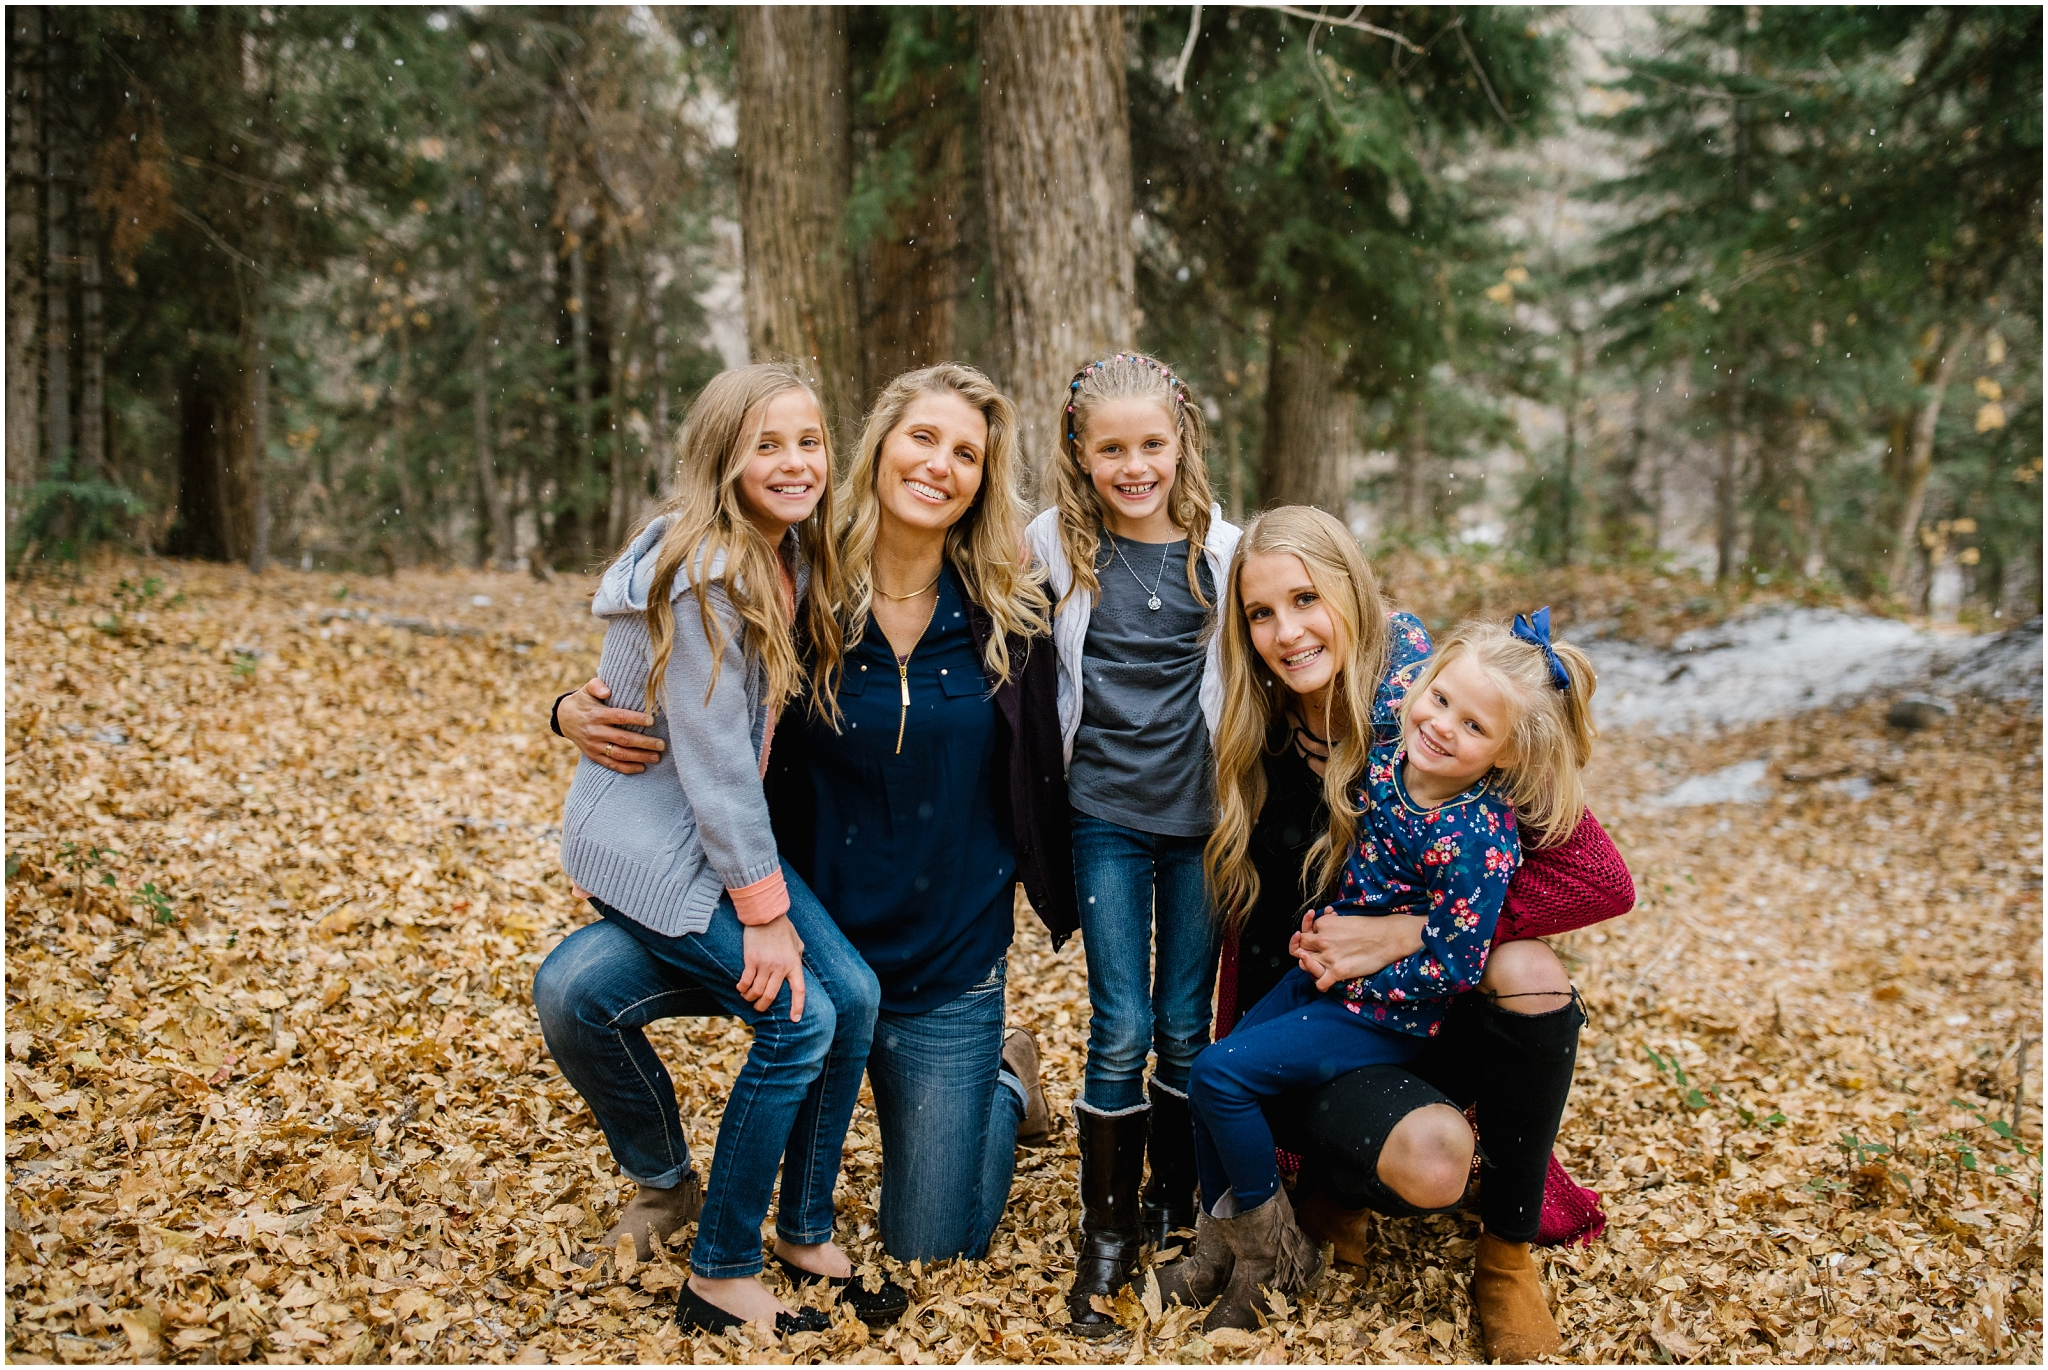 Vance-73_Lizzie-B-Imagery-Utah-Family-Photographer-Salt-Lake-City-Park-City-Utah-County-Payson-Canyon.jpg